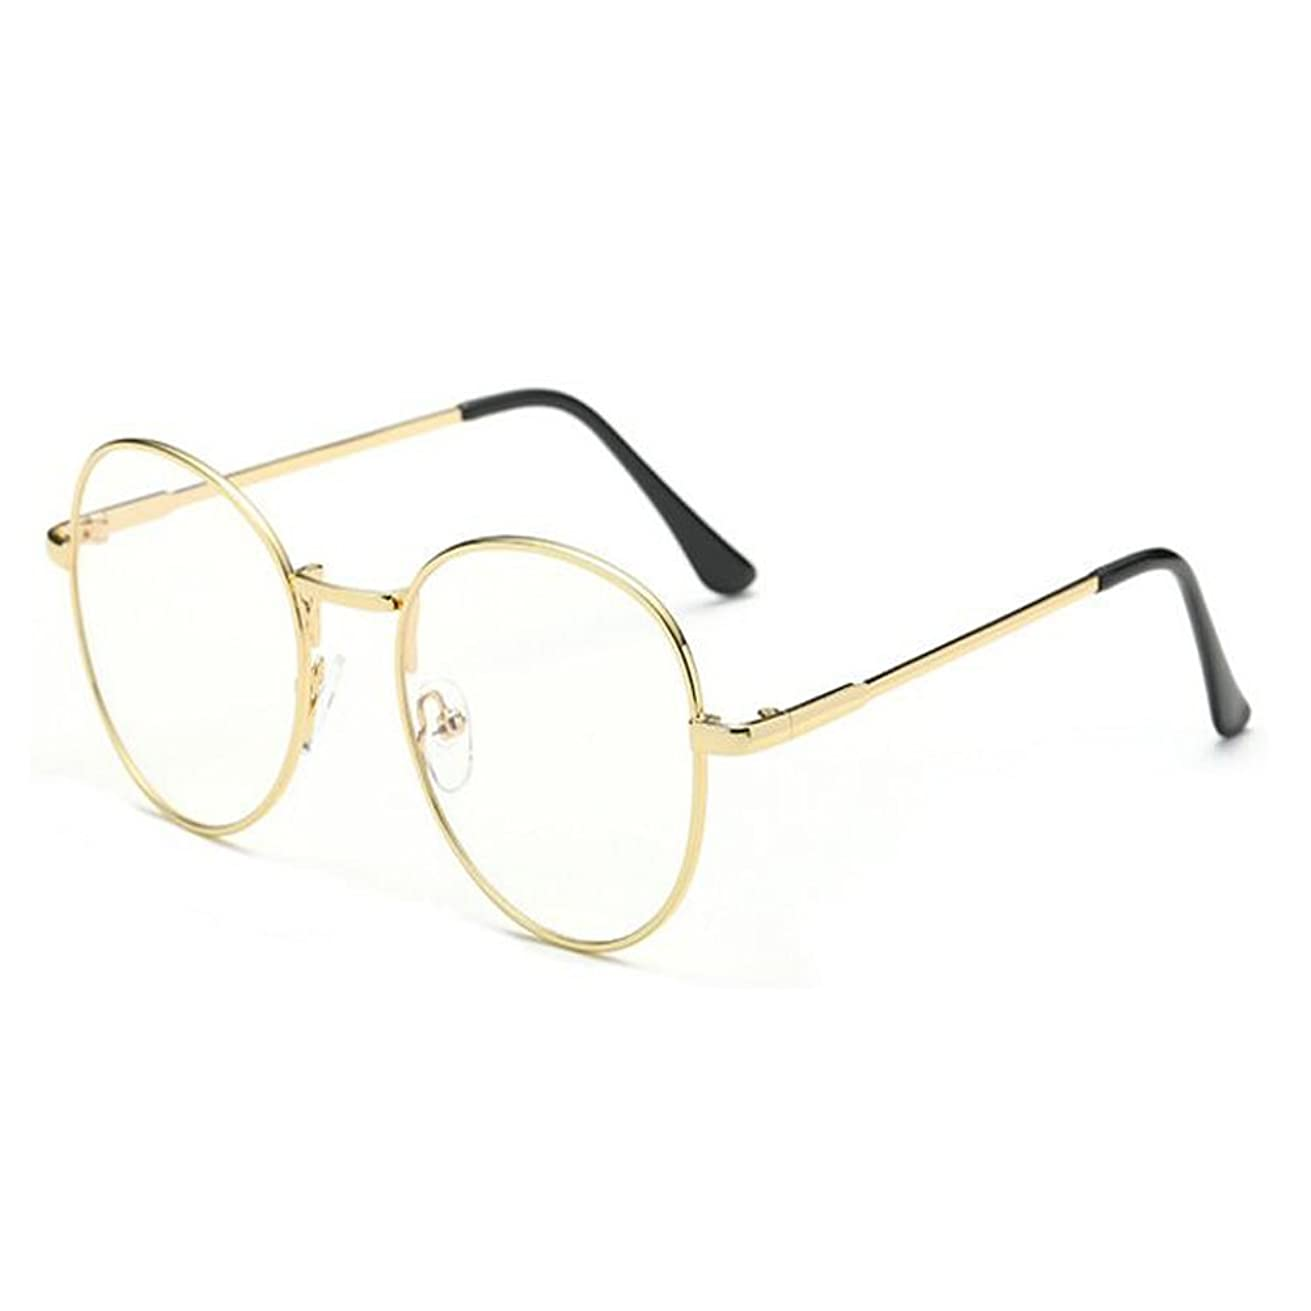 Inlefen Men women Computer Glasses Blue Light Filter Clear Lens Anti UV Reader Eyewear Anti Eyestrain